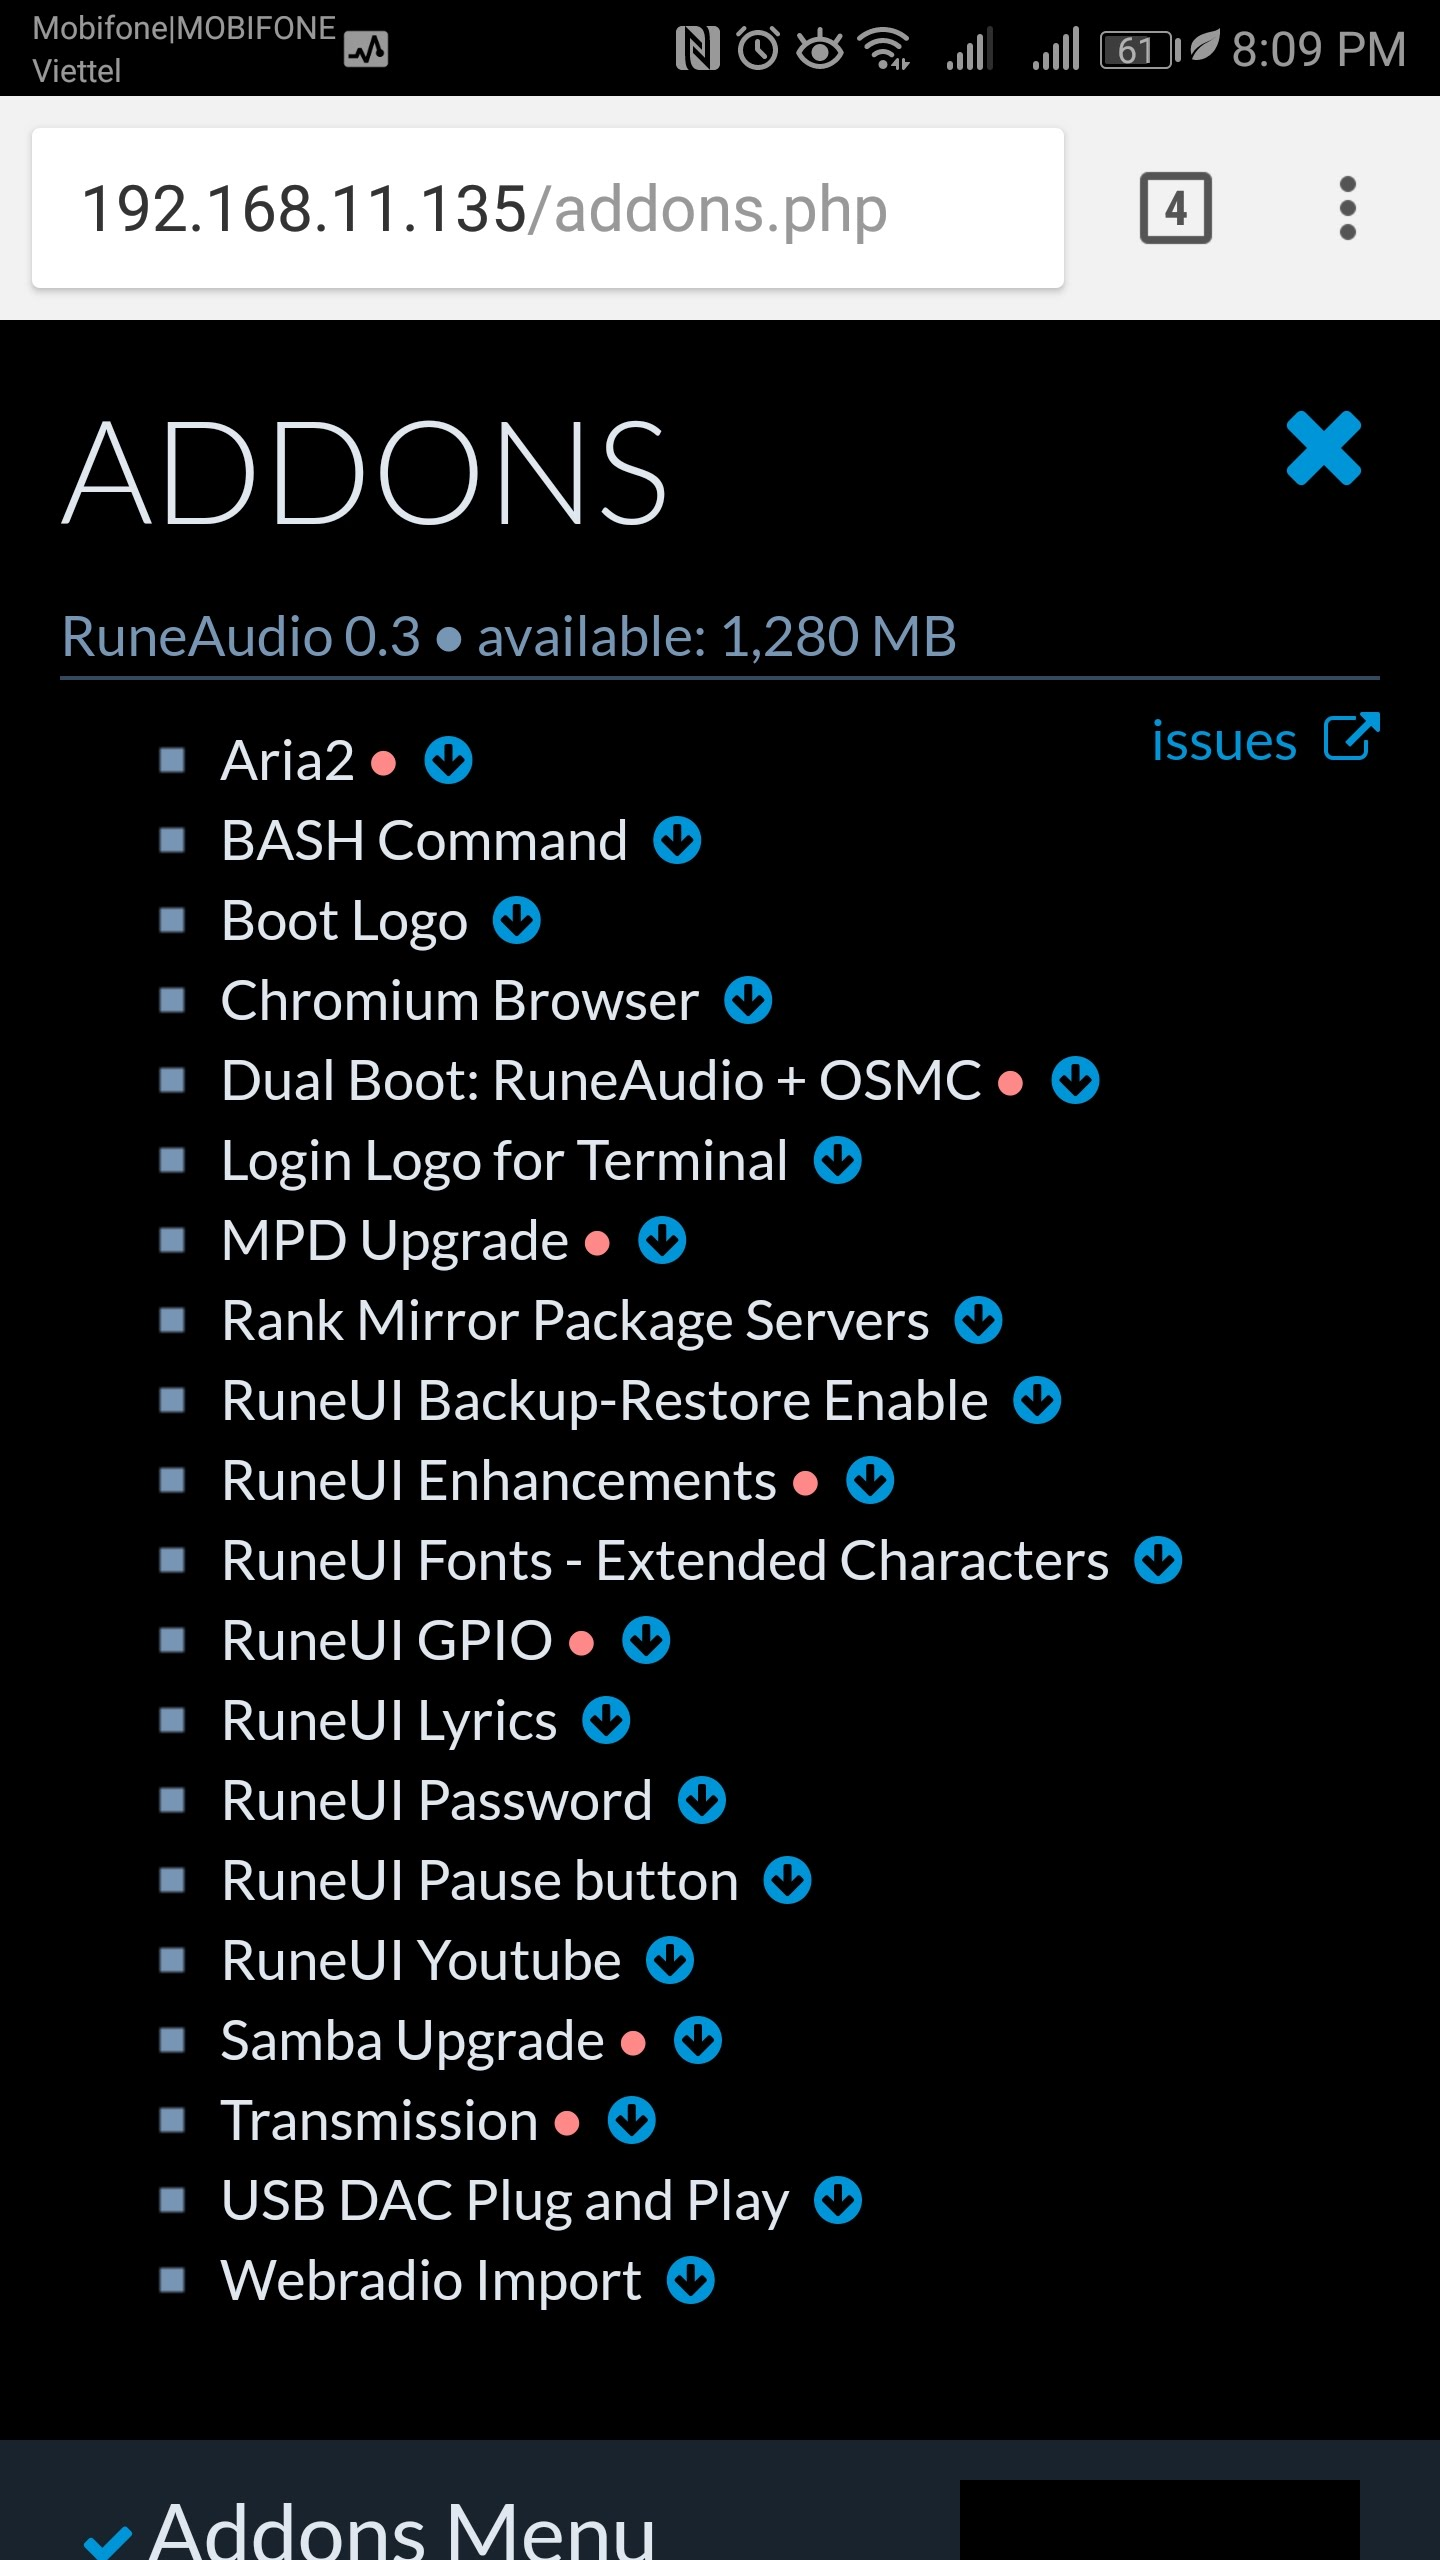 Addon] Addons Menu - Install addons the easy way : Raspberry Pi